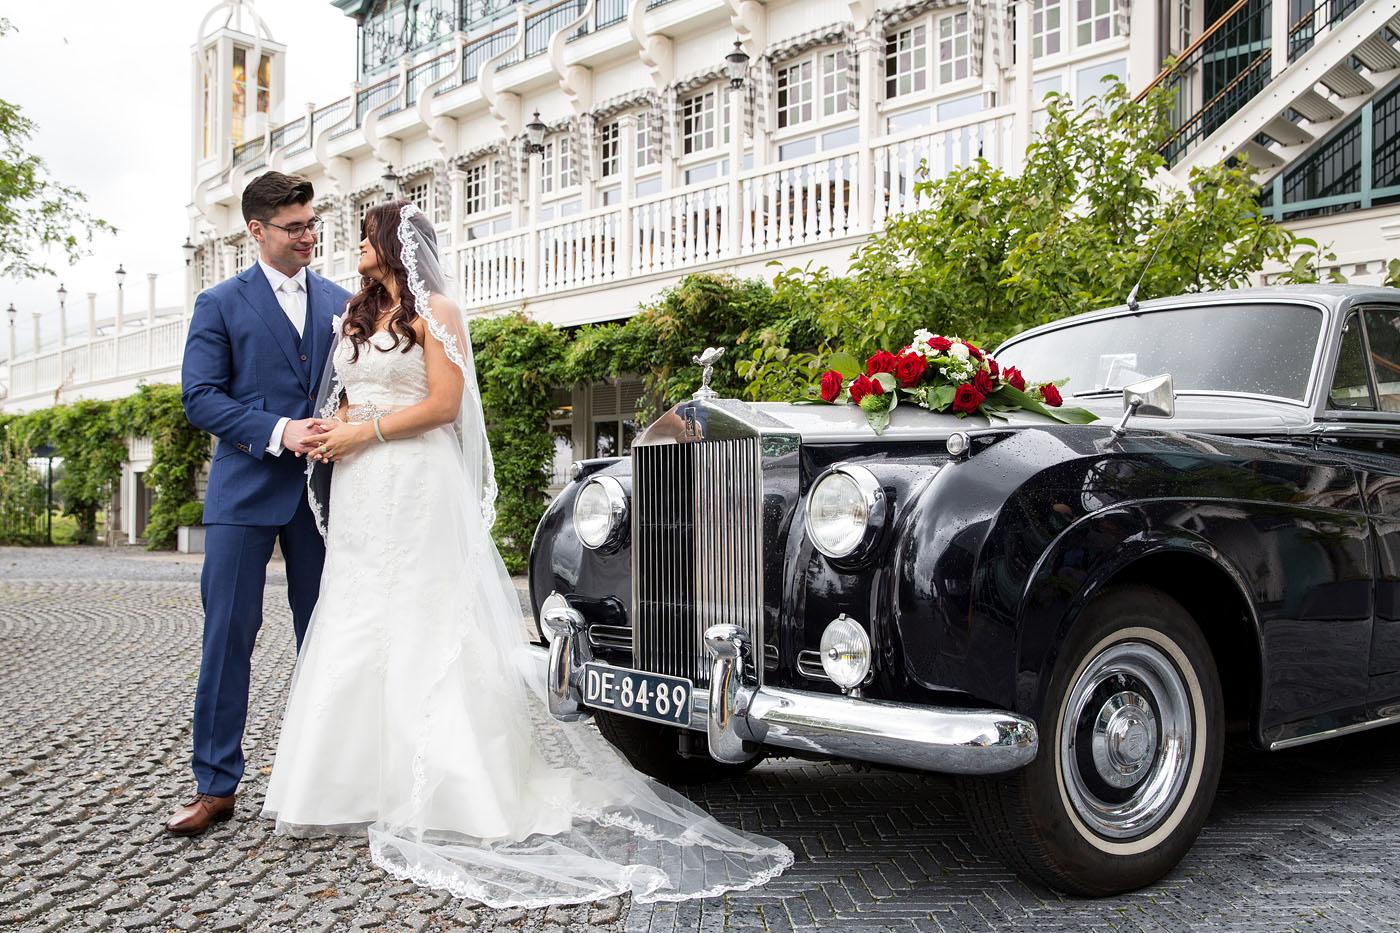 bruiloft-wedding-trouwen-fotograaf-chinees-bobhersbach-rotterdam-mooi